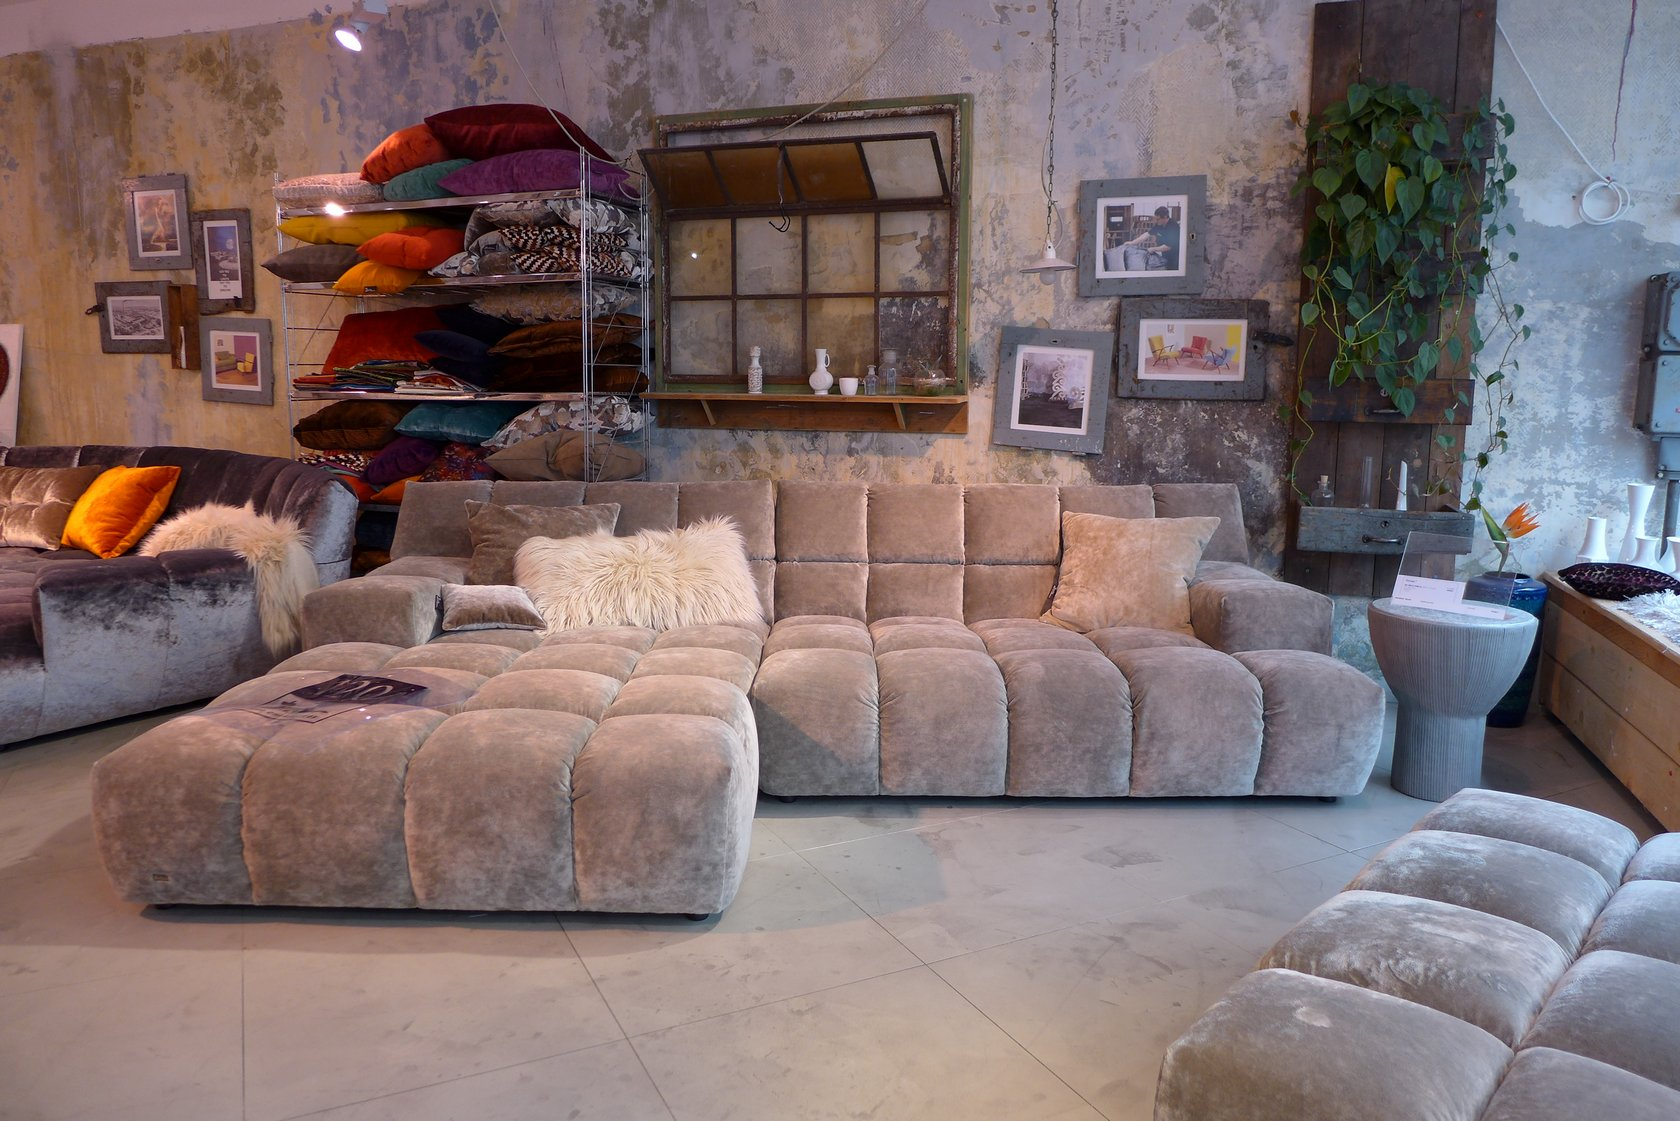 bretz store frankfurt am parkhaus konrad adenauer strasse. Black Bedroom Furniture Sets. Home Design Ideas